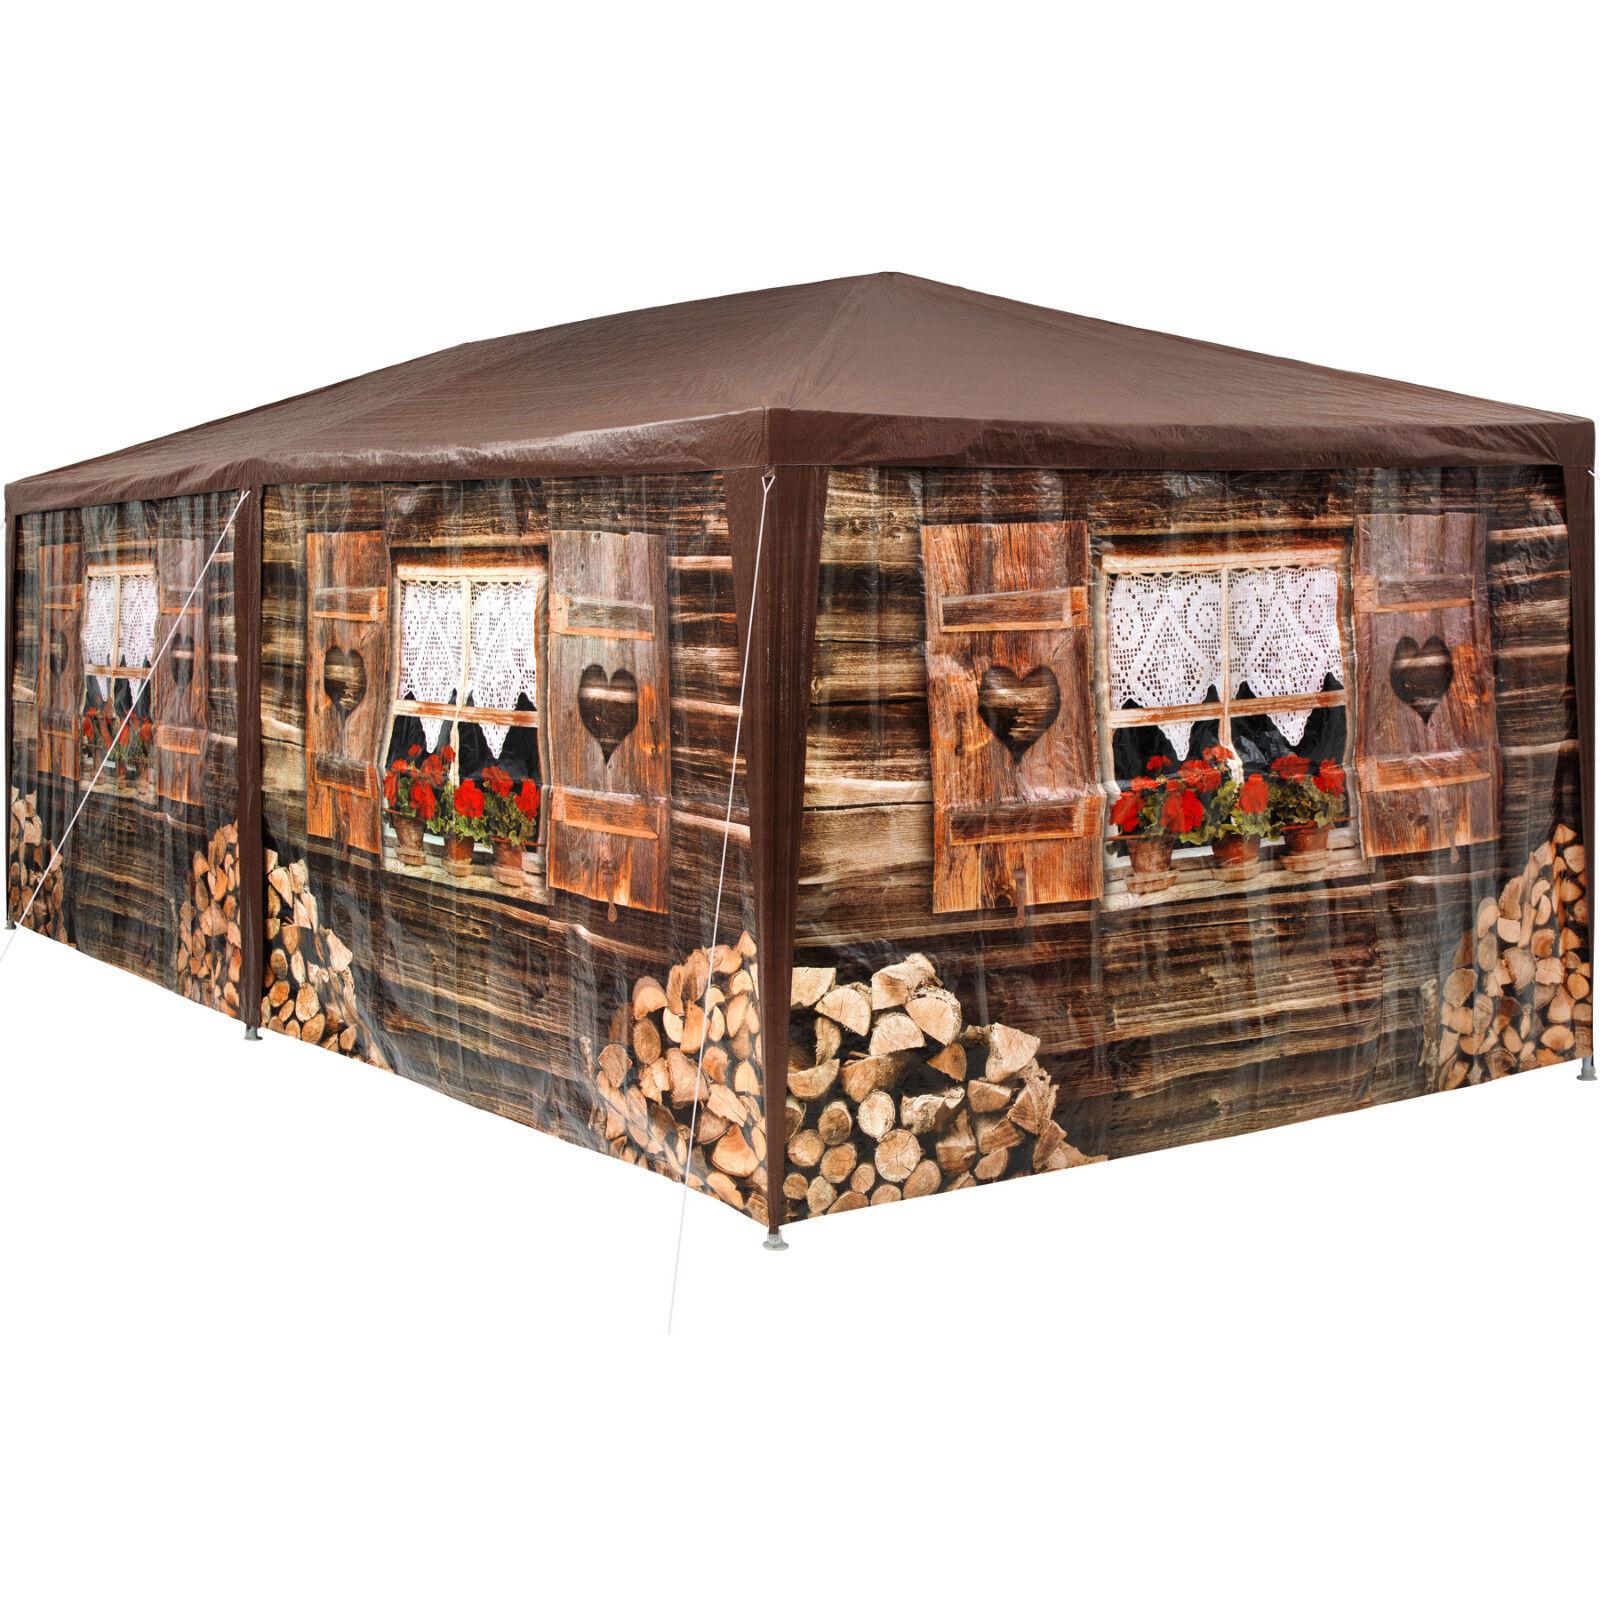 GAZEBO 3x6 M almhütte tendone party tendone giardino tenda della birra Tenda Tenda APRES SKI